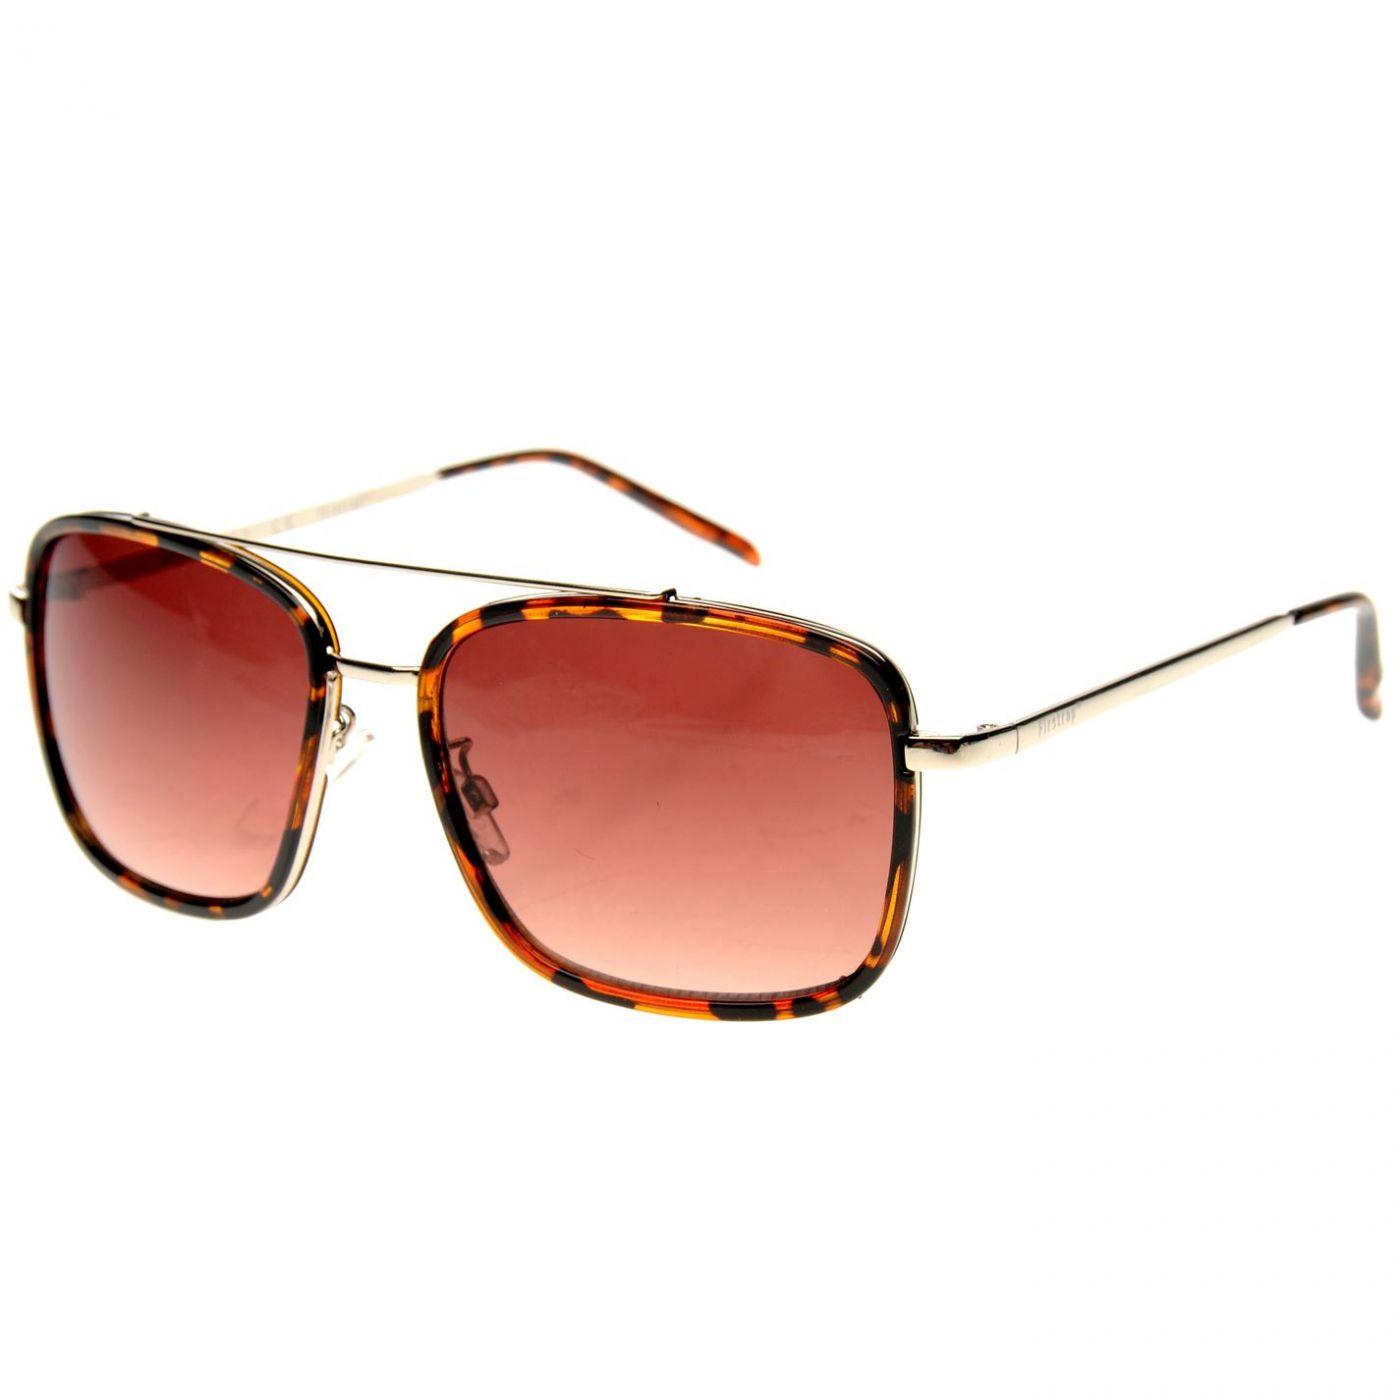 1a563f1aebb5 Firetrap MF201 Sunglasses Mens - FACTCOOL